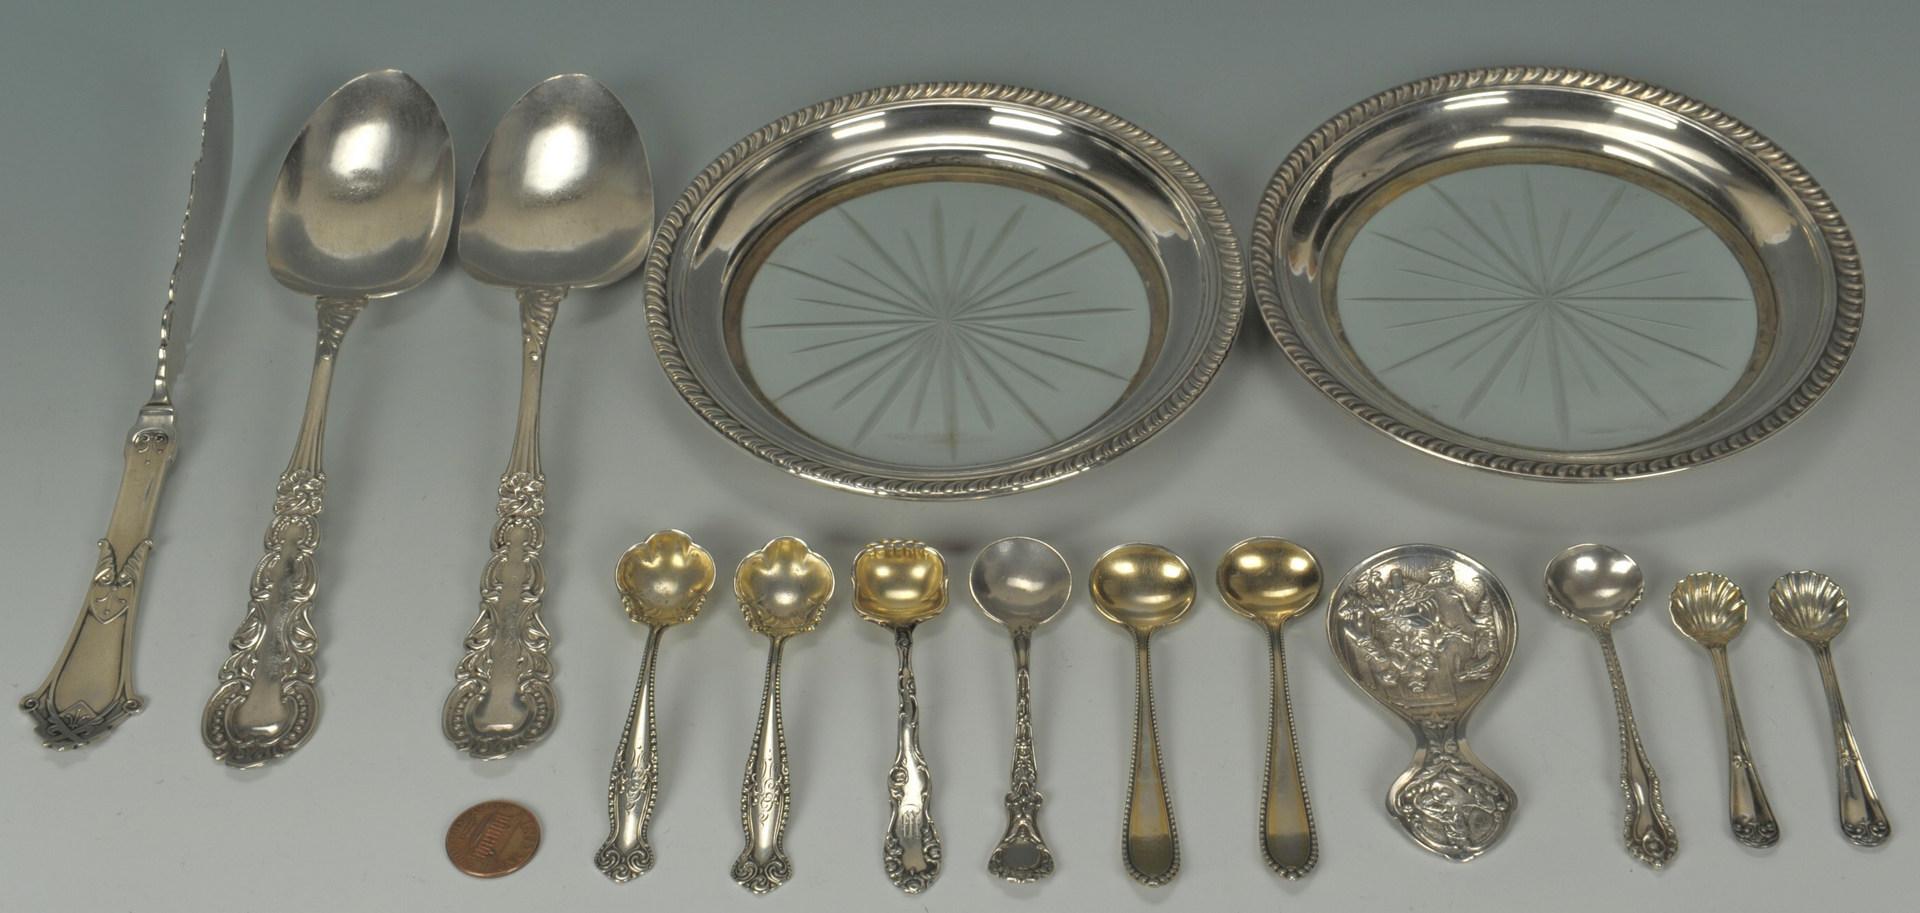 Lot 506: Sterling & Coin Flatware, 15 pcs inc. salt spoons